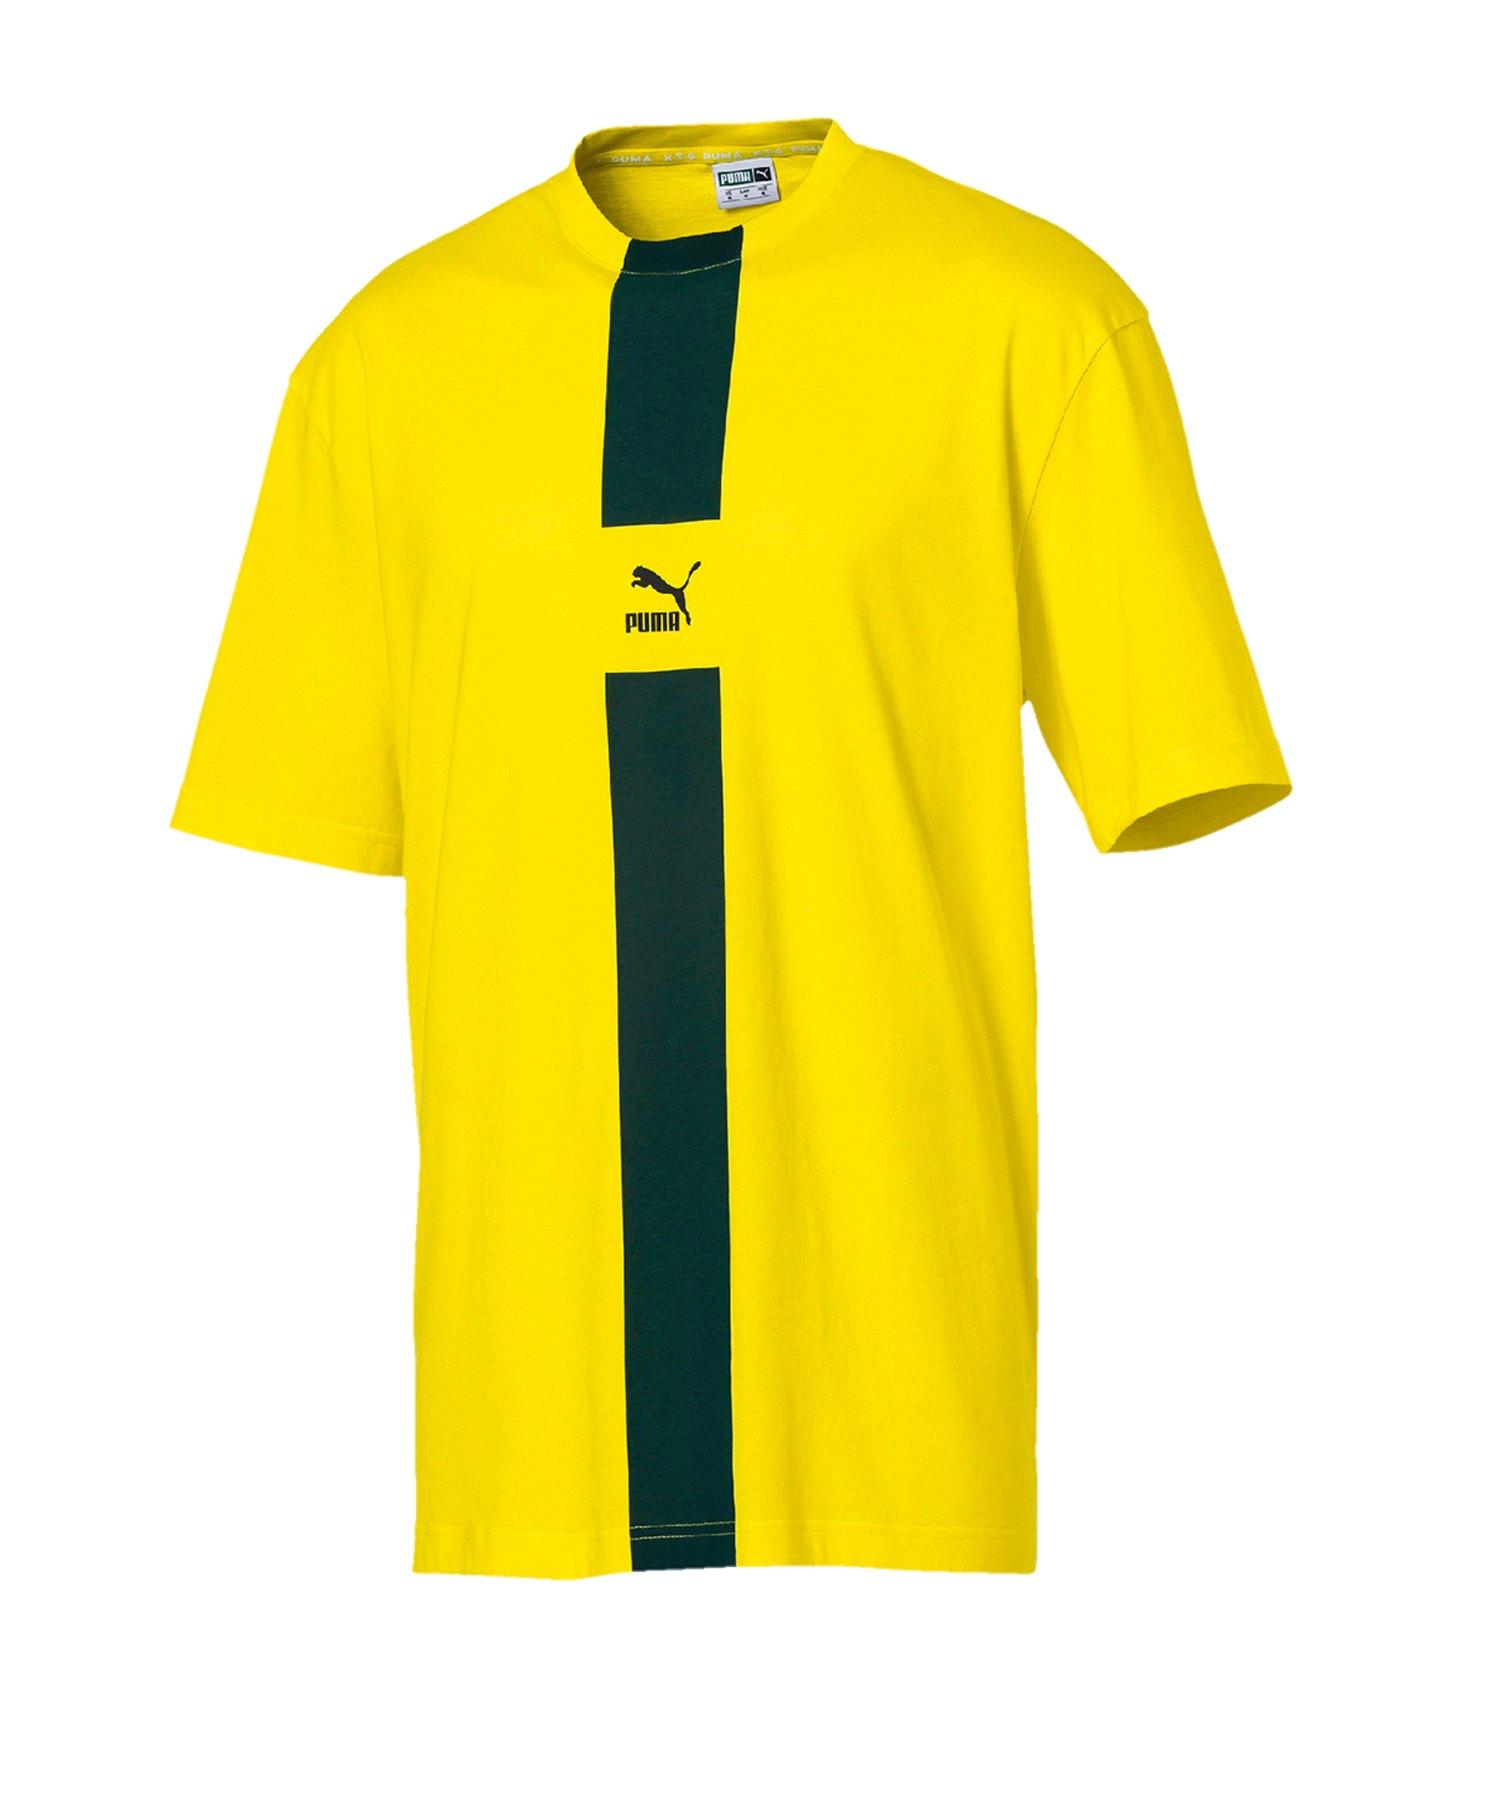 PUMA XTG Tee T-Shirt Gelb F36 - gelb